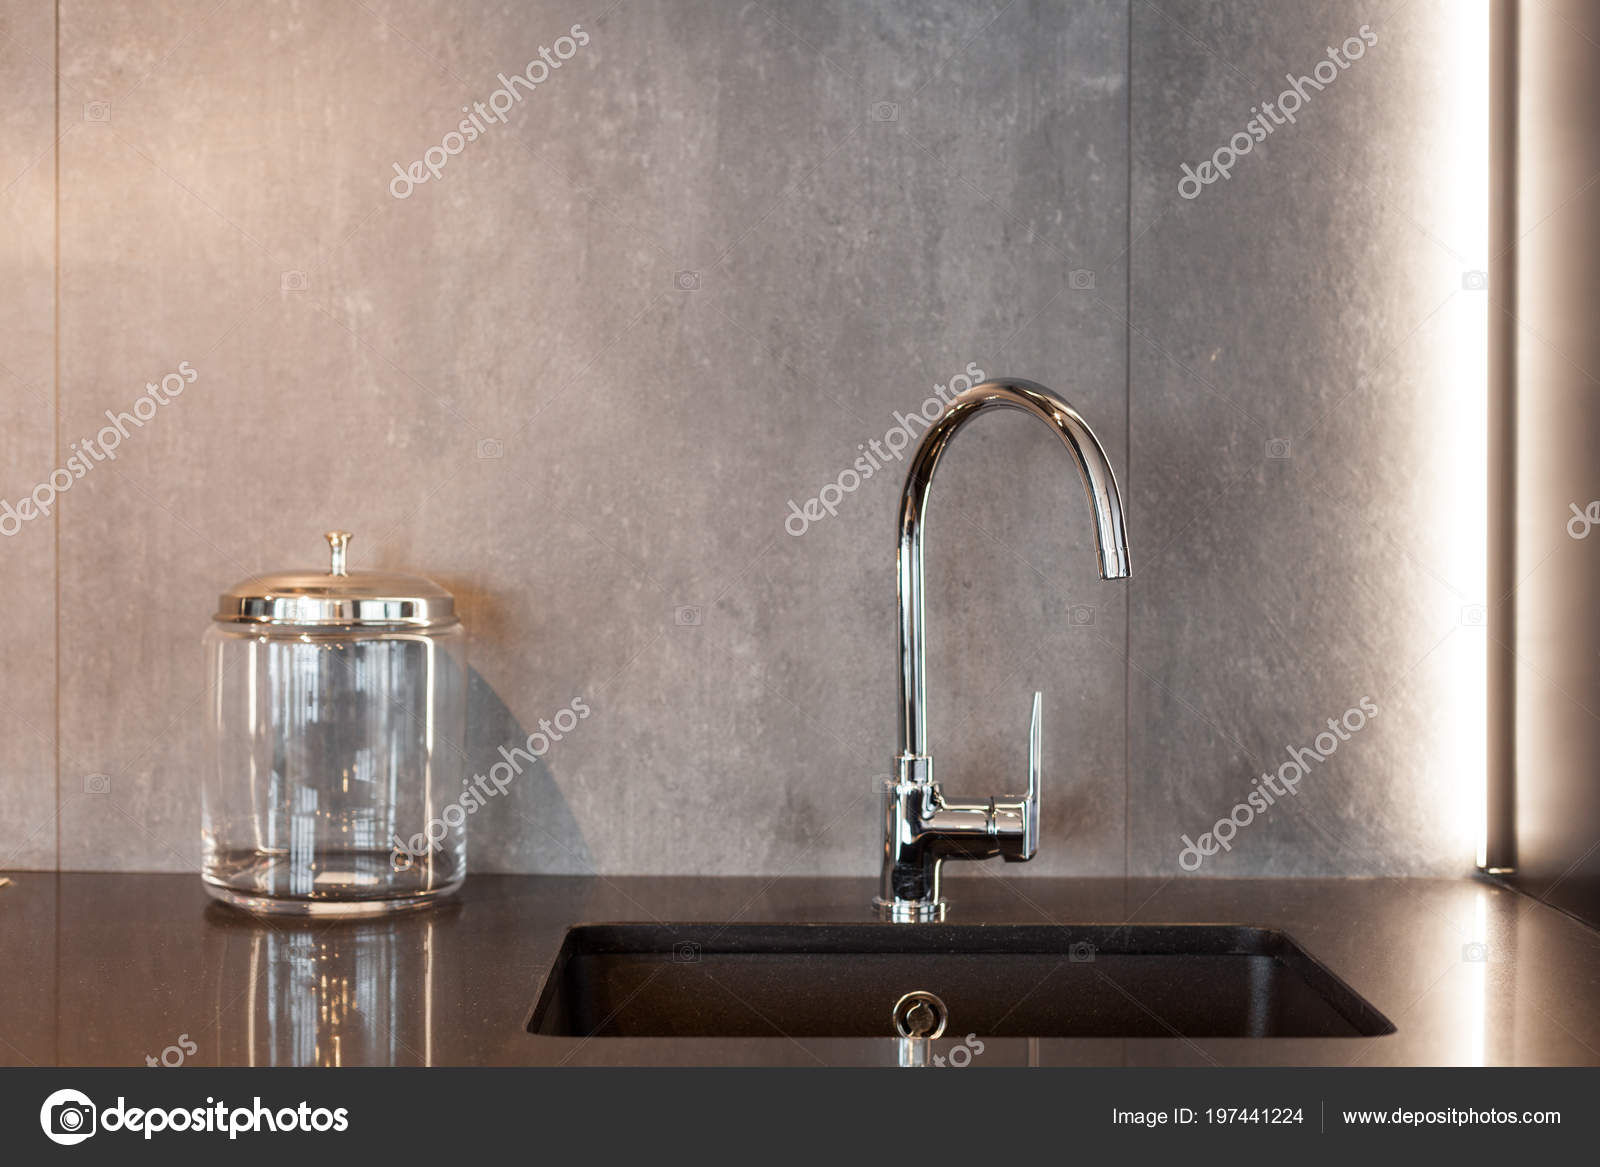 gray kitchen sink wallpaper backsplash 一个长方形的设计师厨房水槽与铬水水龙头对灰色纹理墙的细节 图库照片 照片作者brizmaker